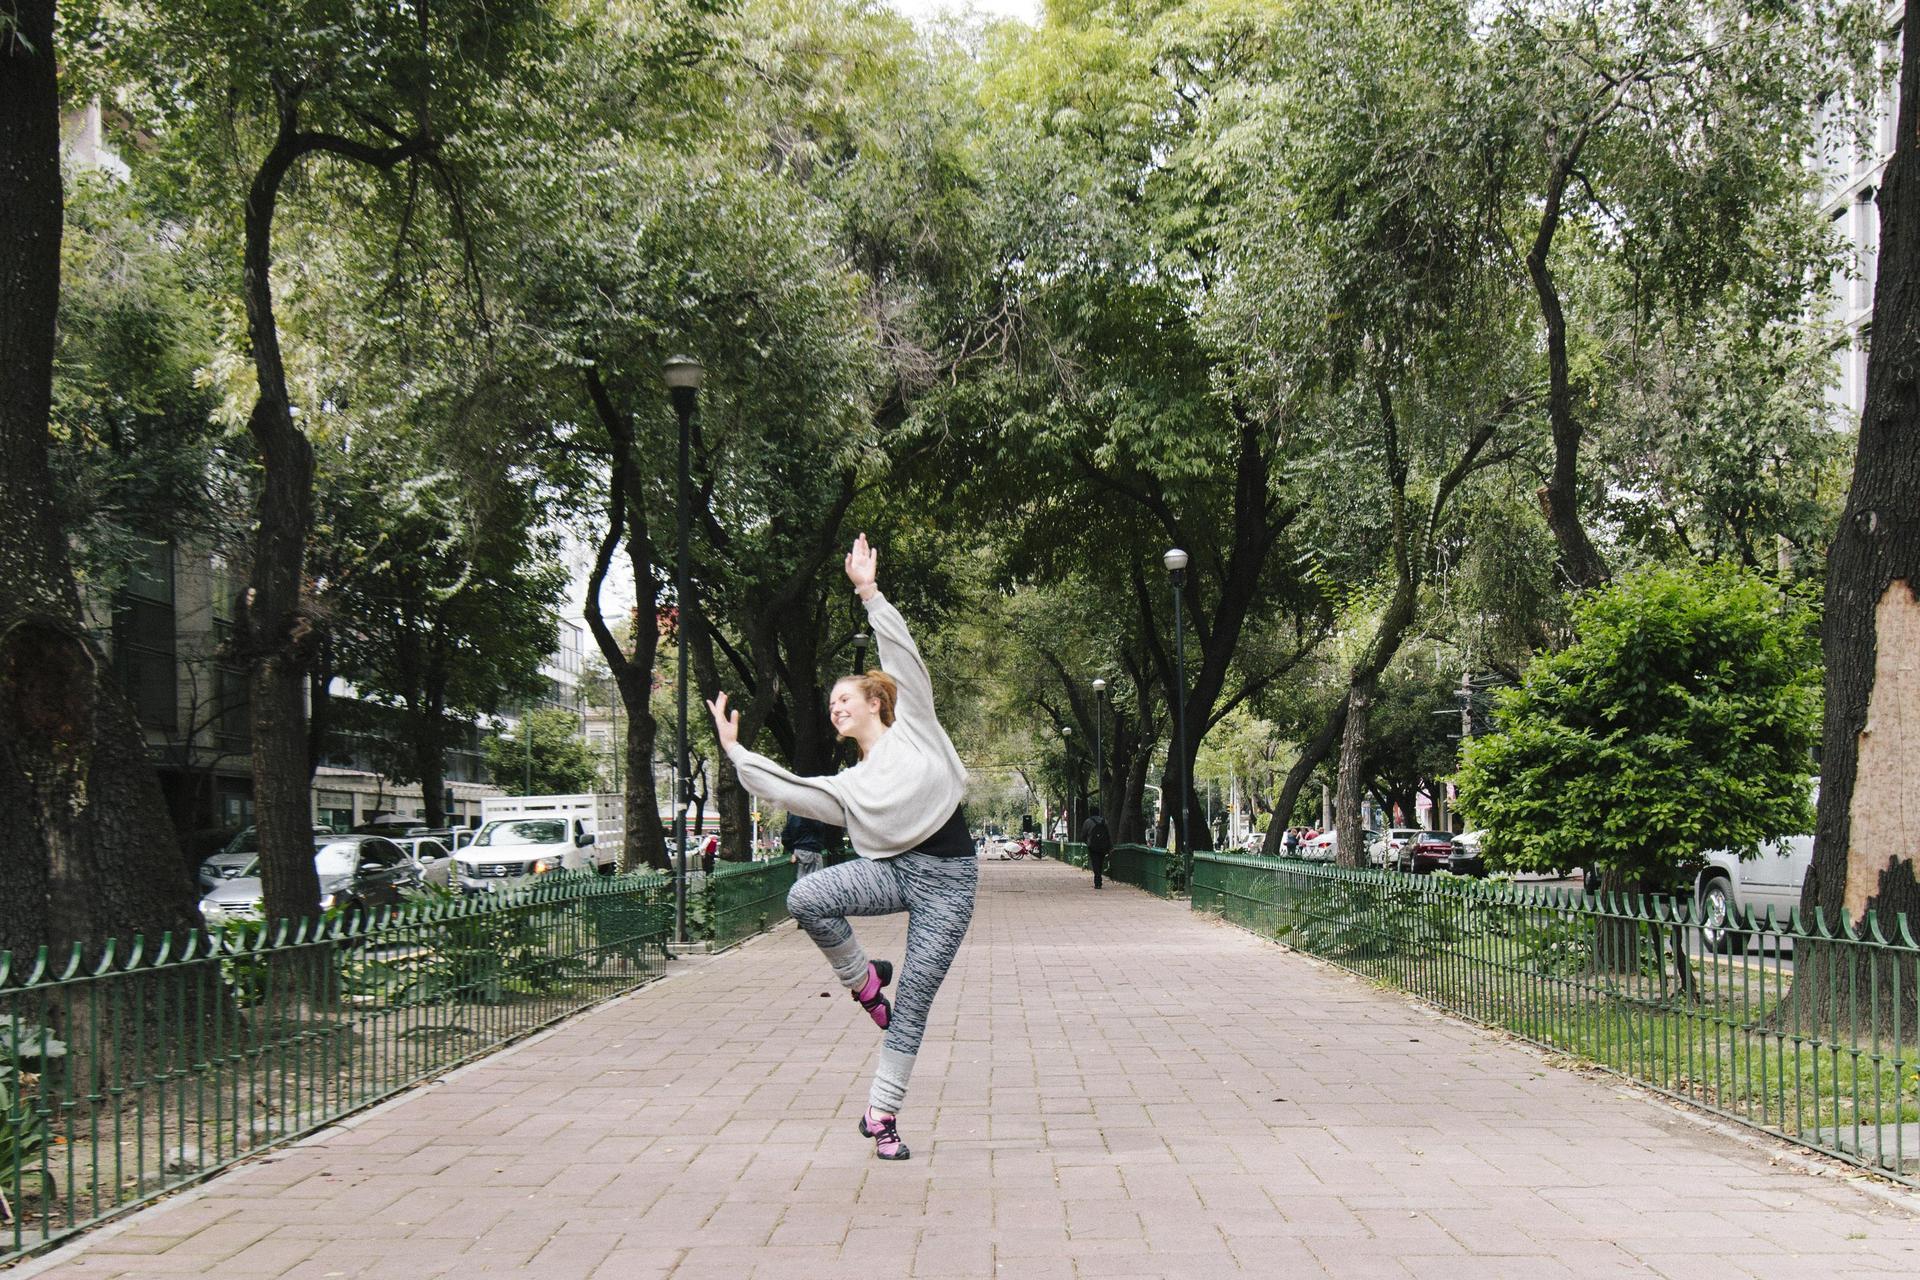 Alumna bailando